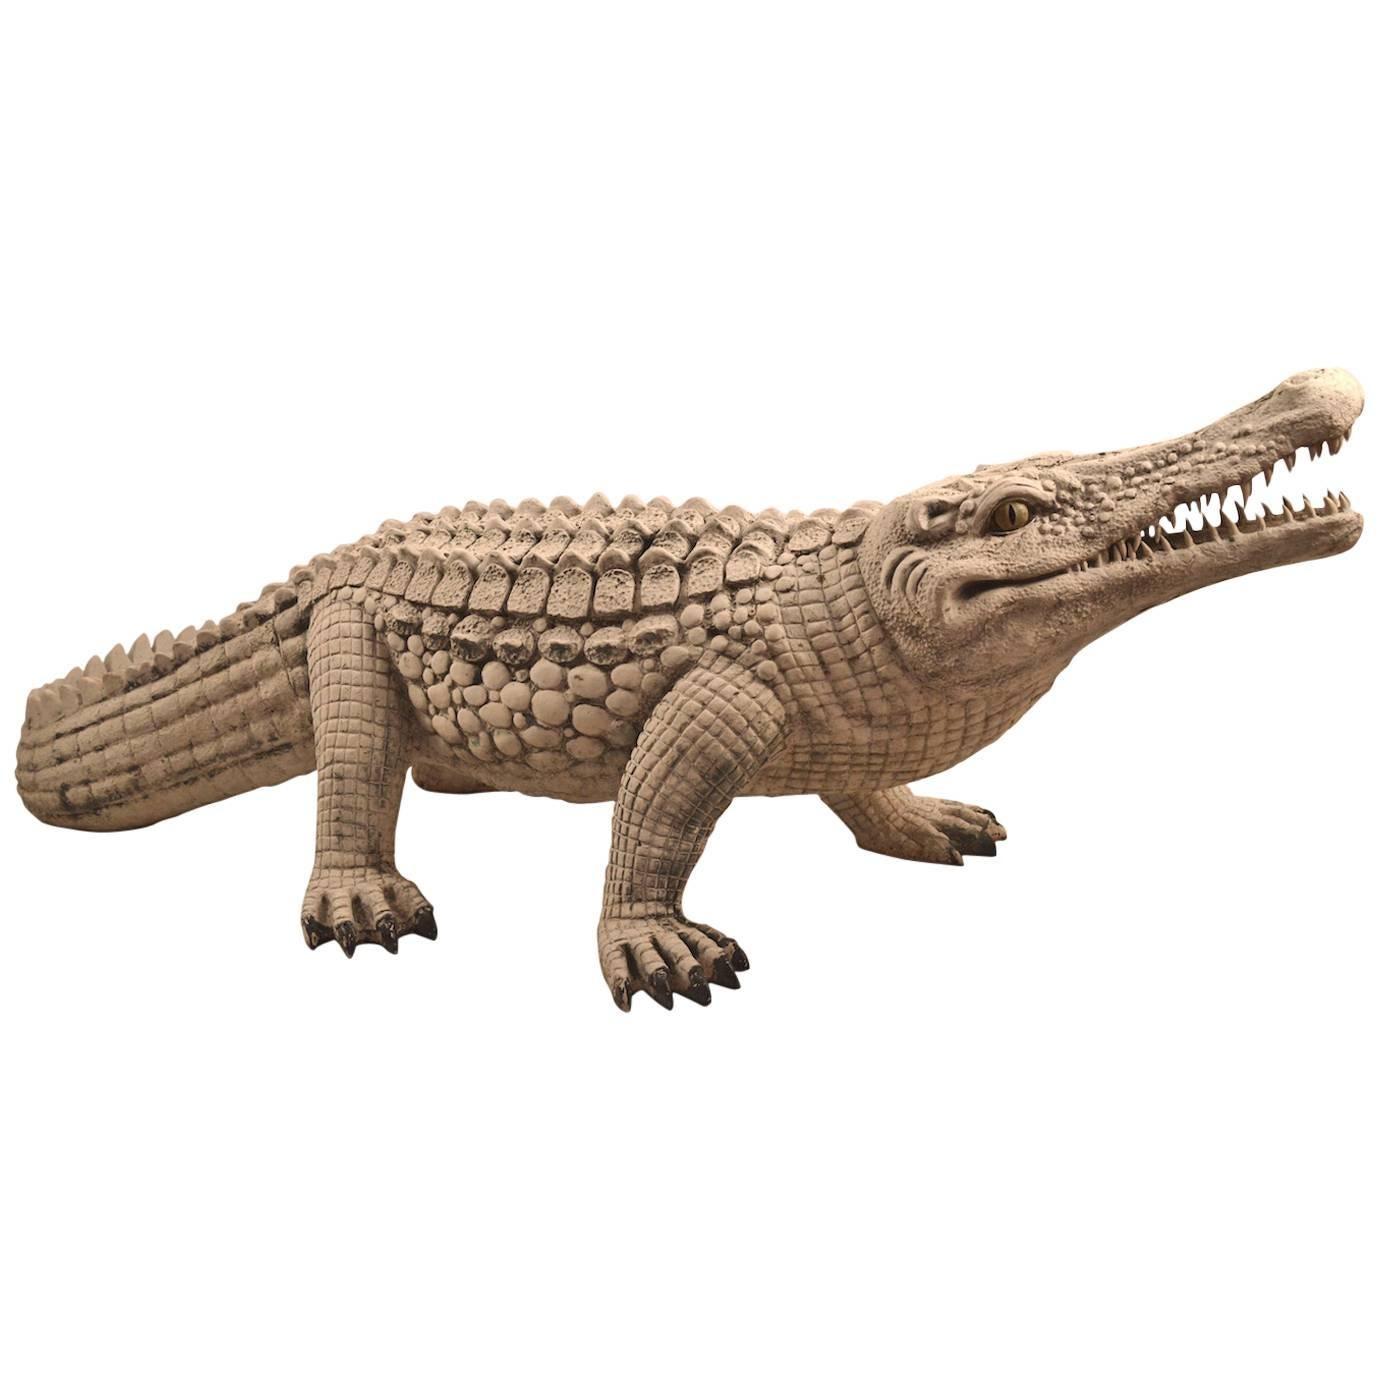 Fiberglass Crocodile in White Paint Surface